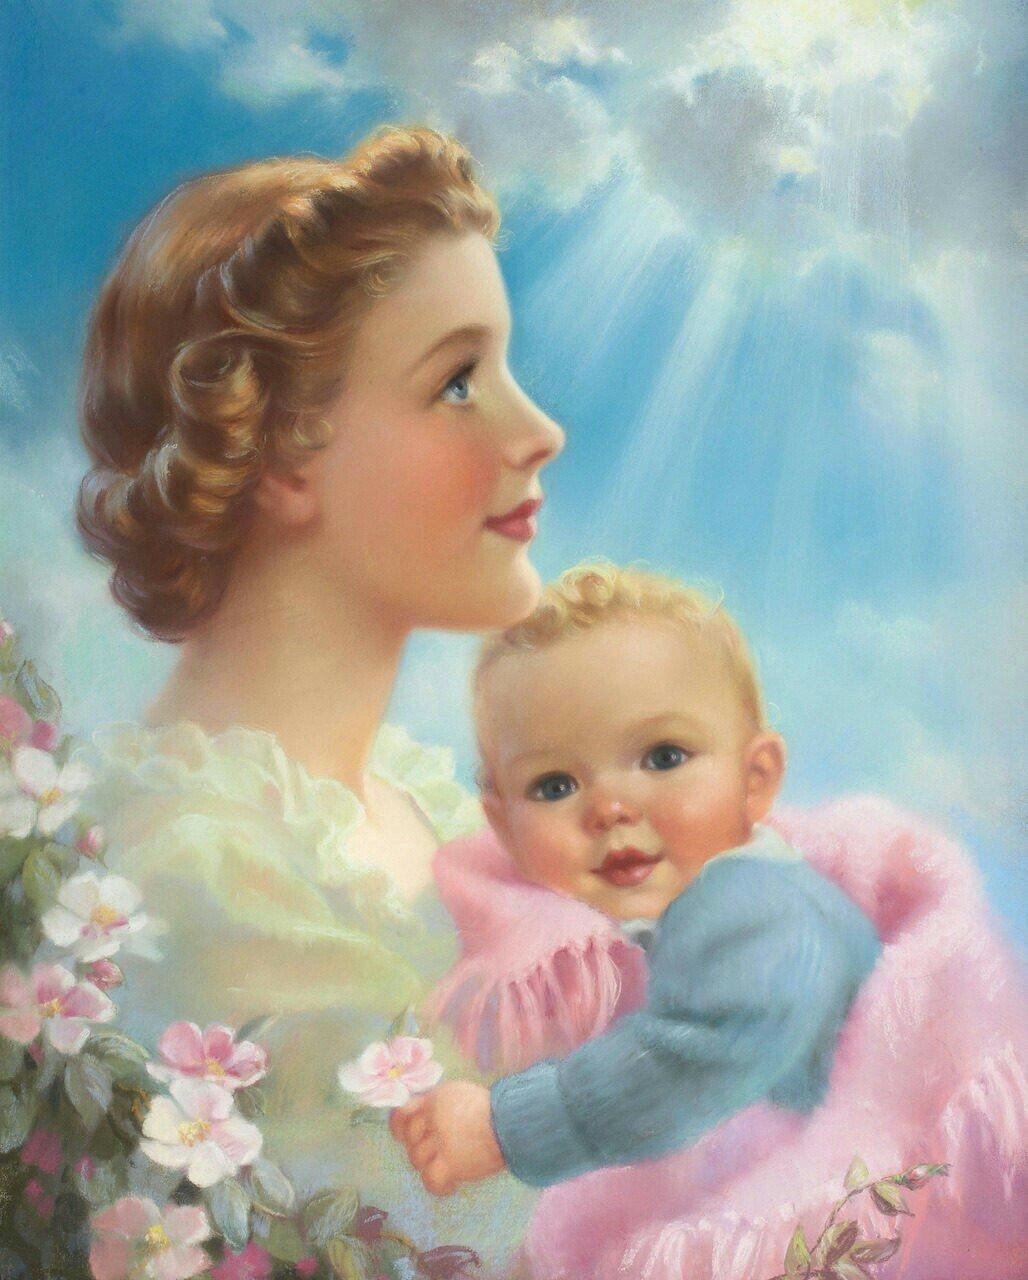 Картинки новый, открытки с младенцем на руках